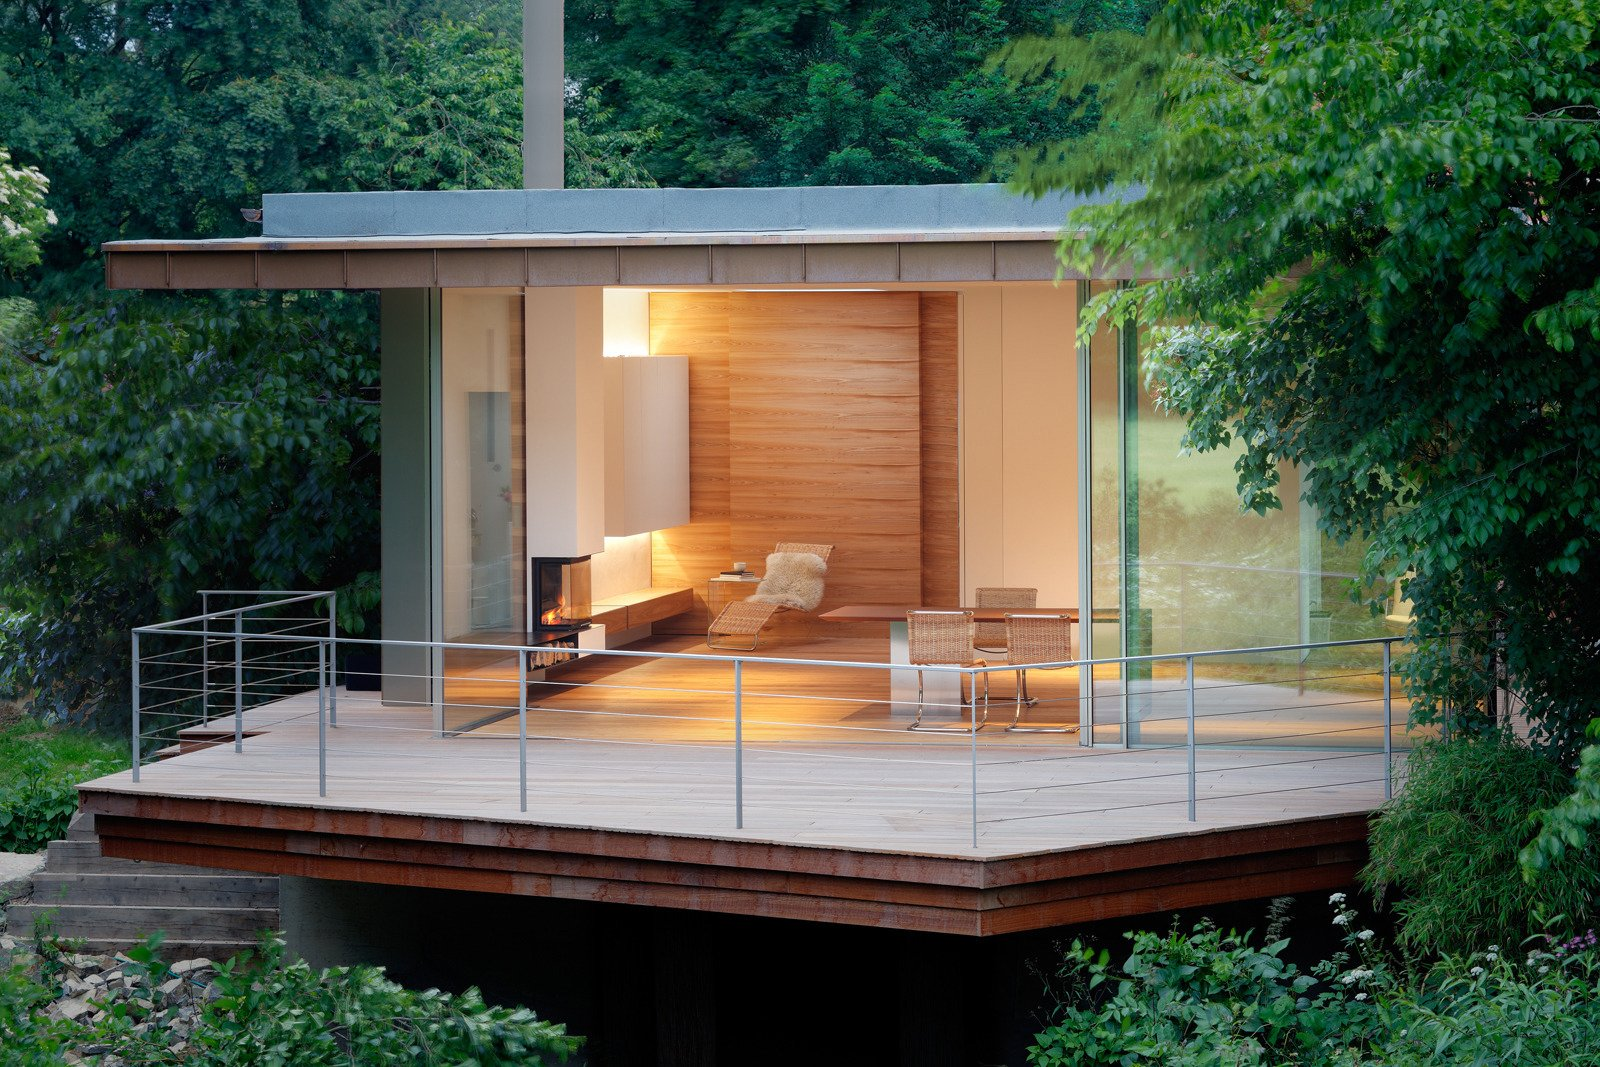 House Rheder II by Falkenberg Innenarchitektur - Photo 3 of 6